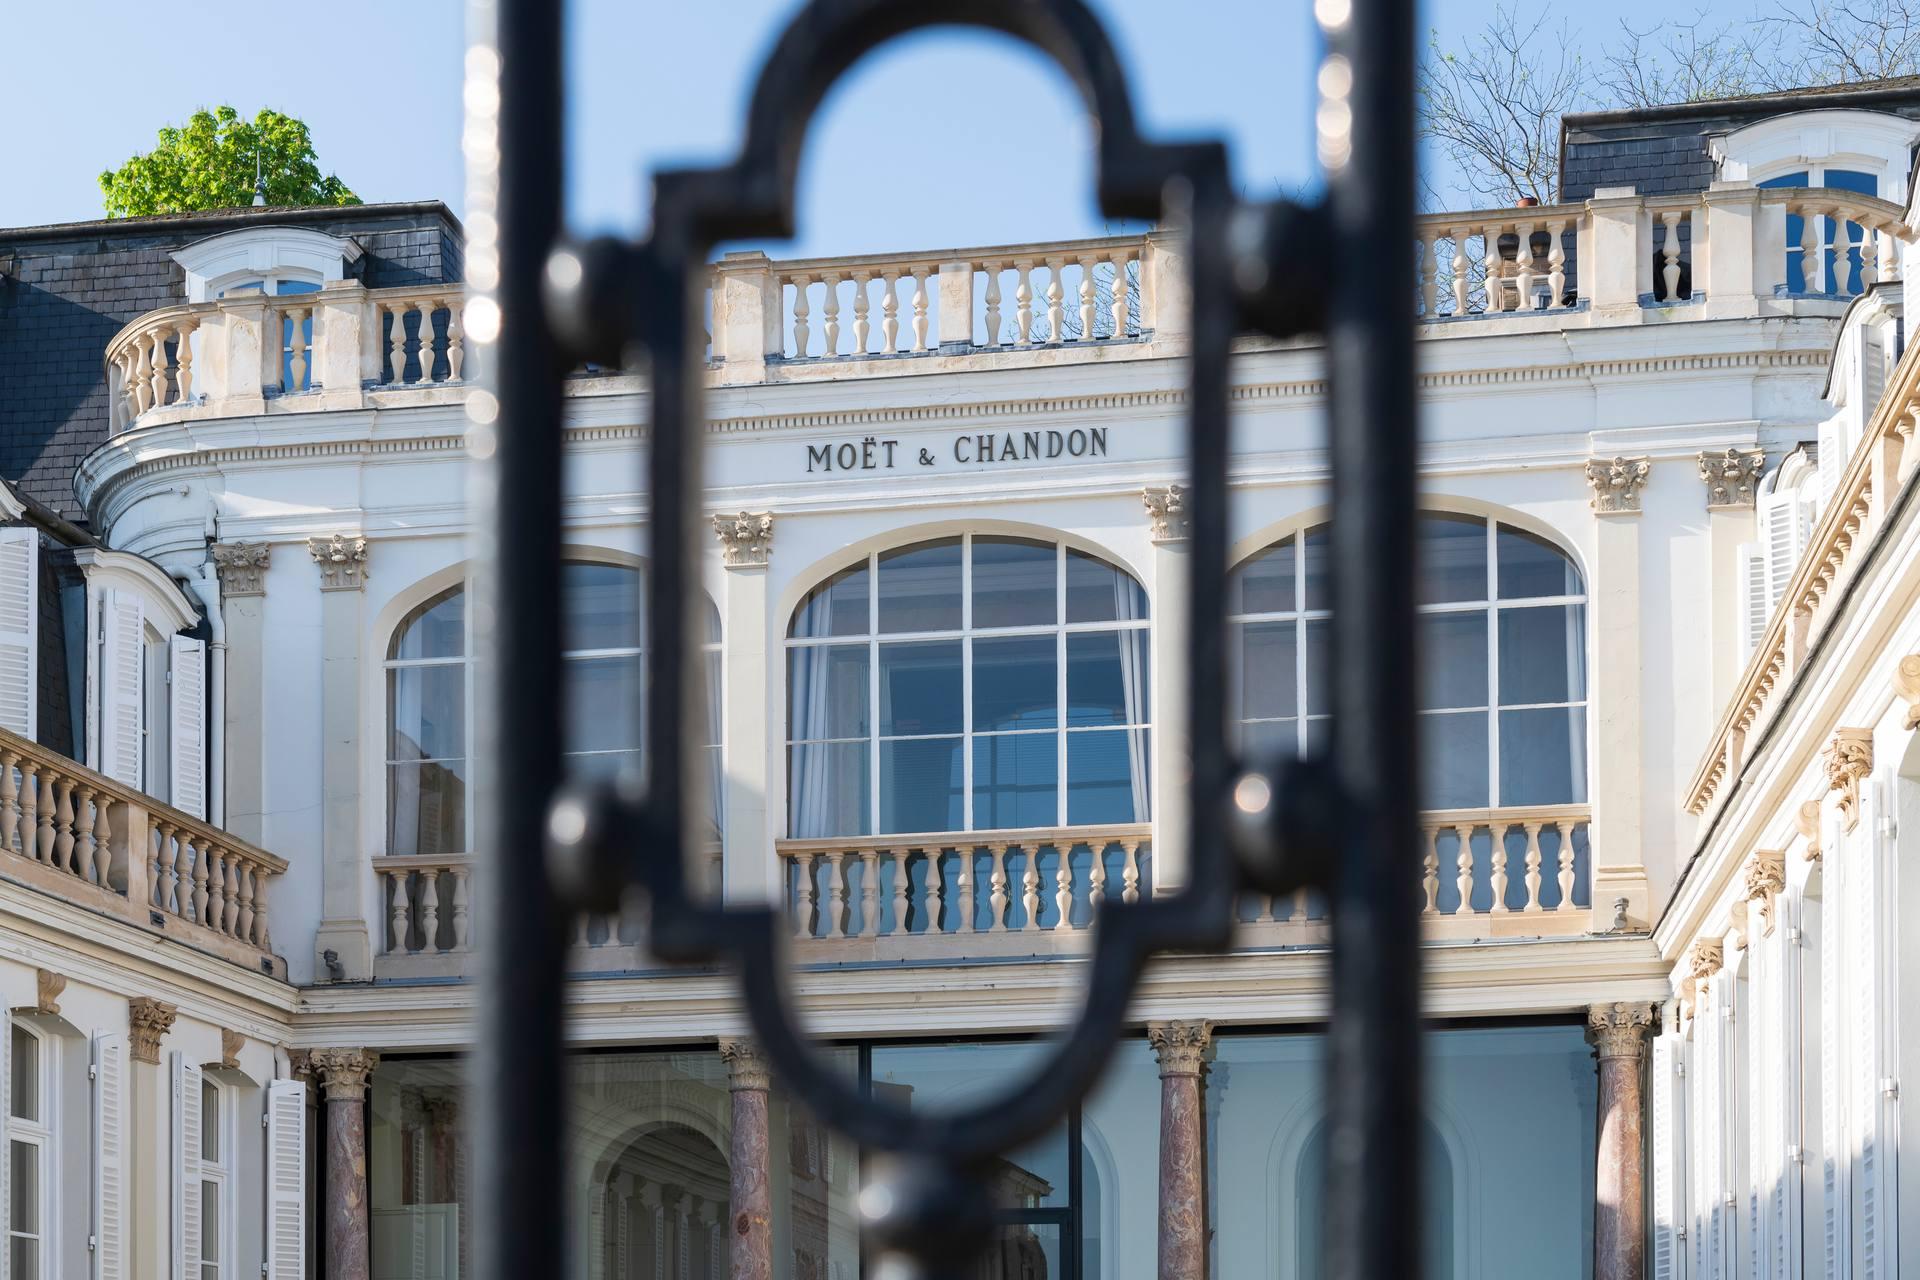 Moët & Chandon Imperial 150 anniversario